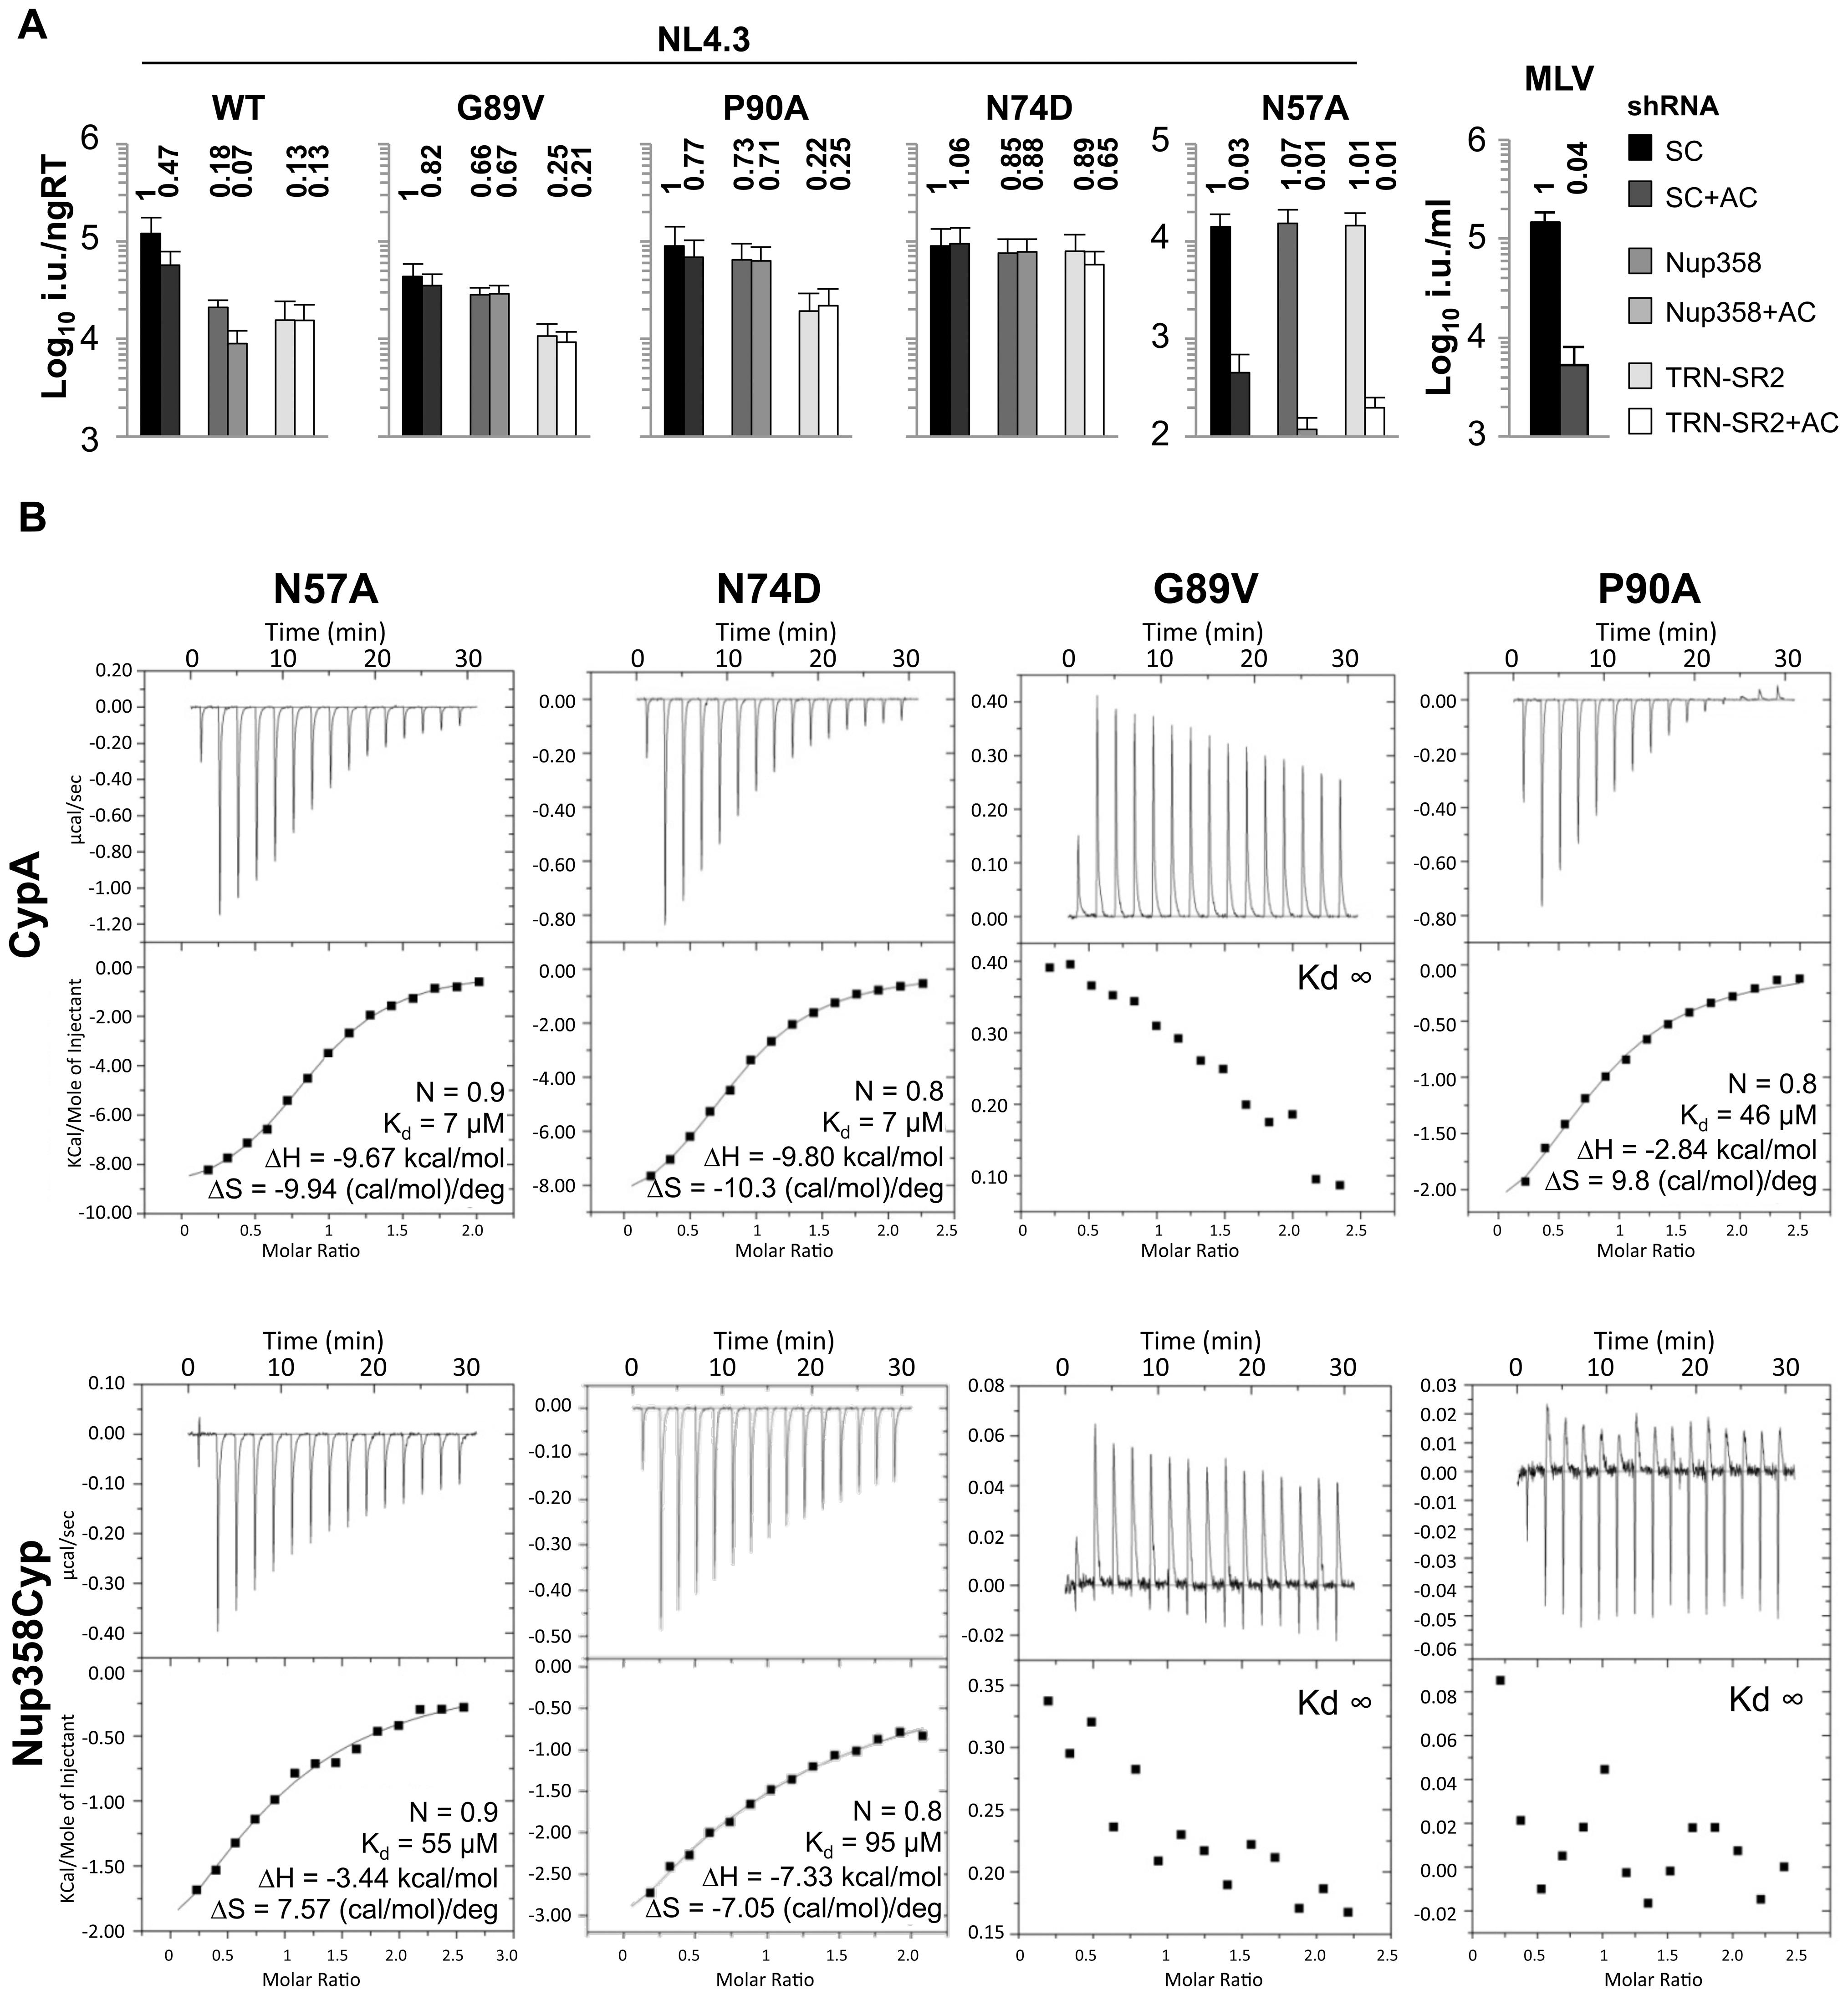 Effect of CA mutants on Nup358/TRN-SR2 RNAi sensitivity and Nup358Cyp binding.